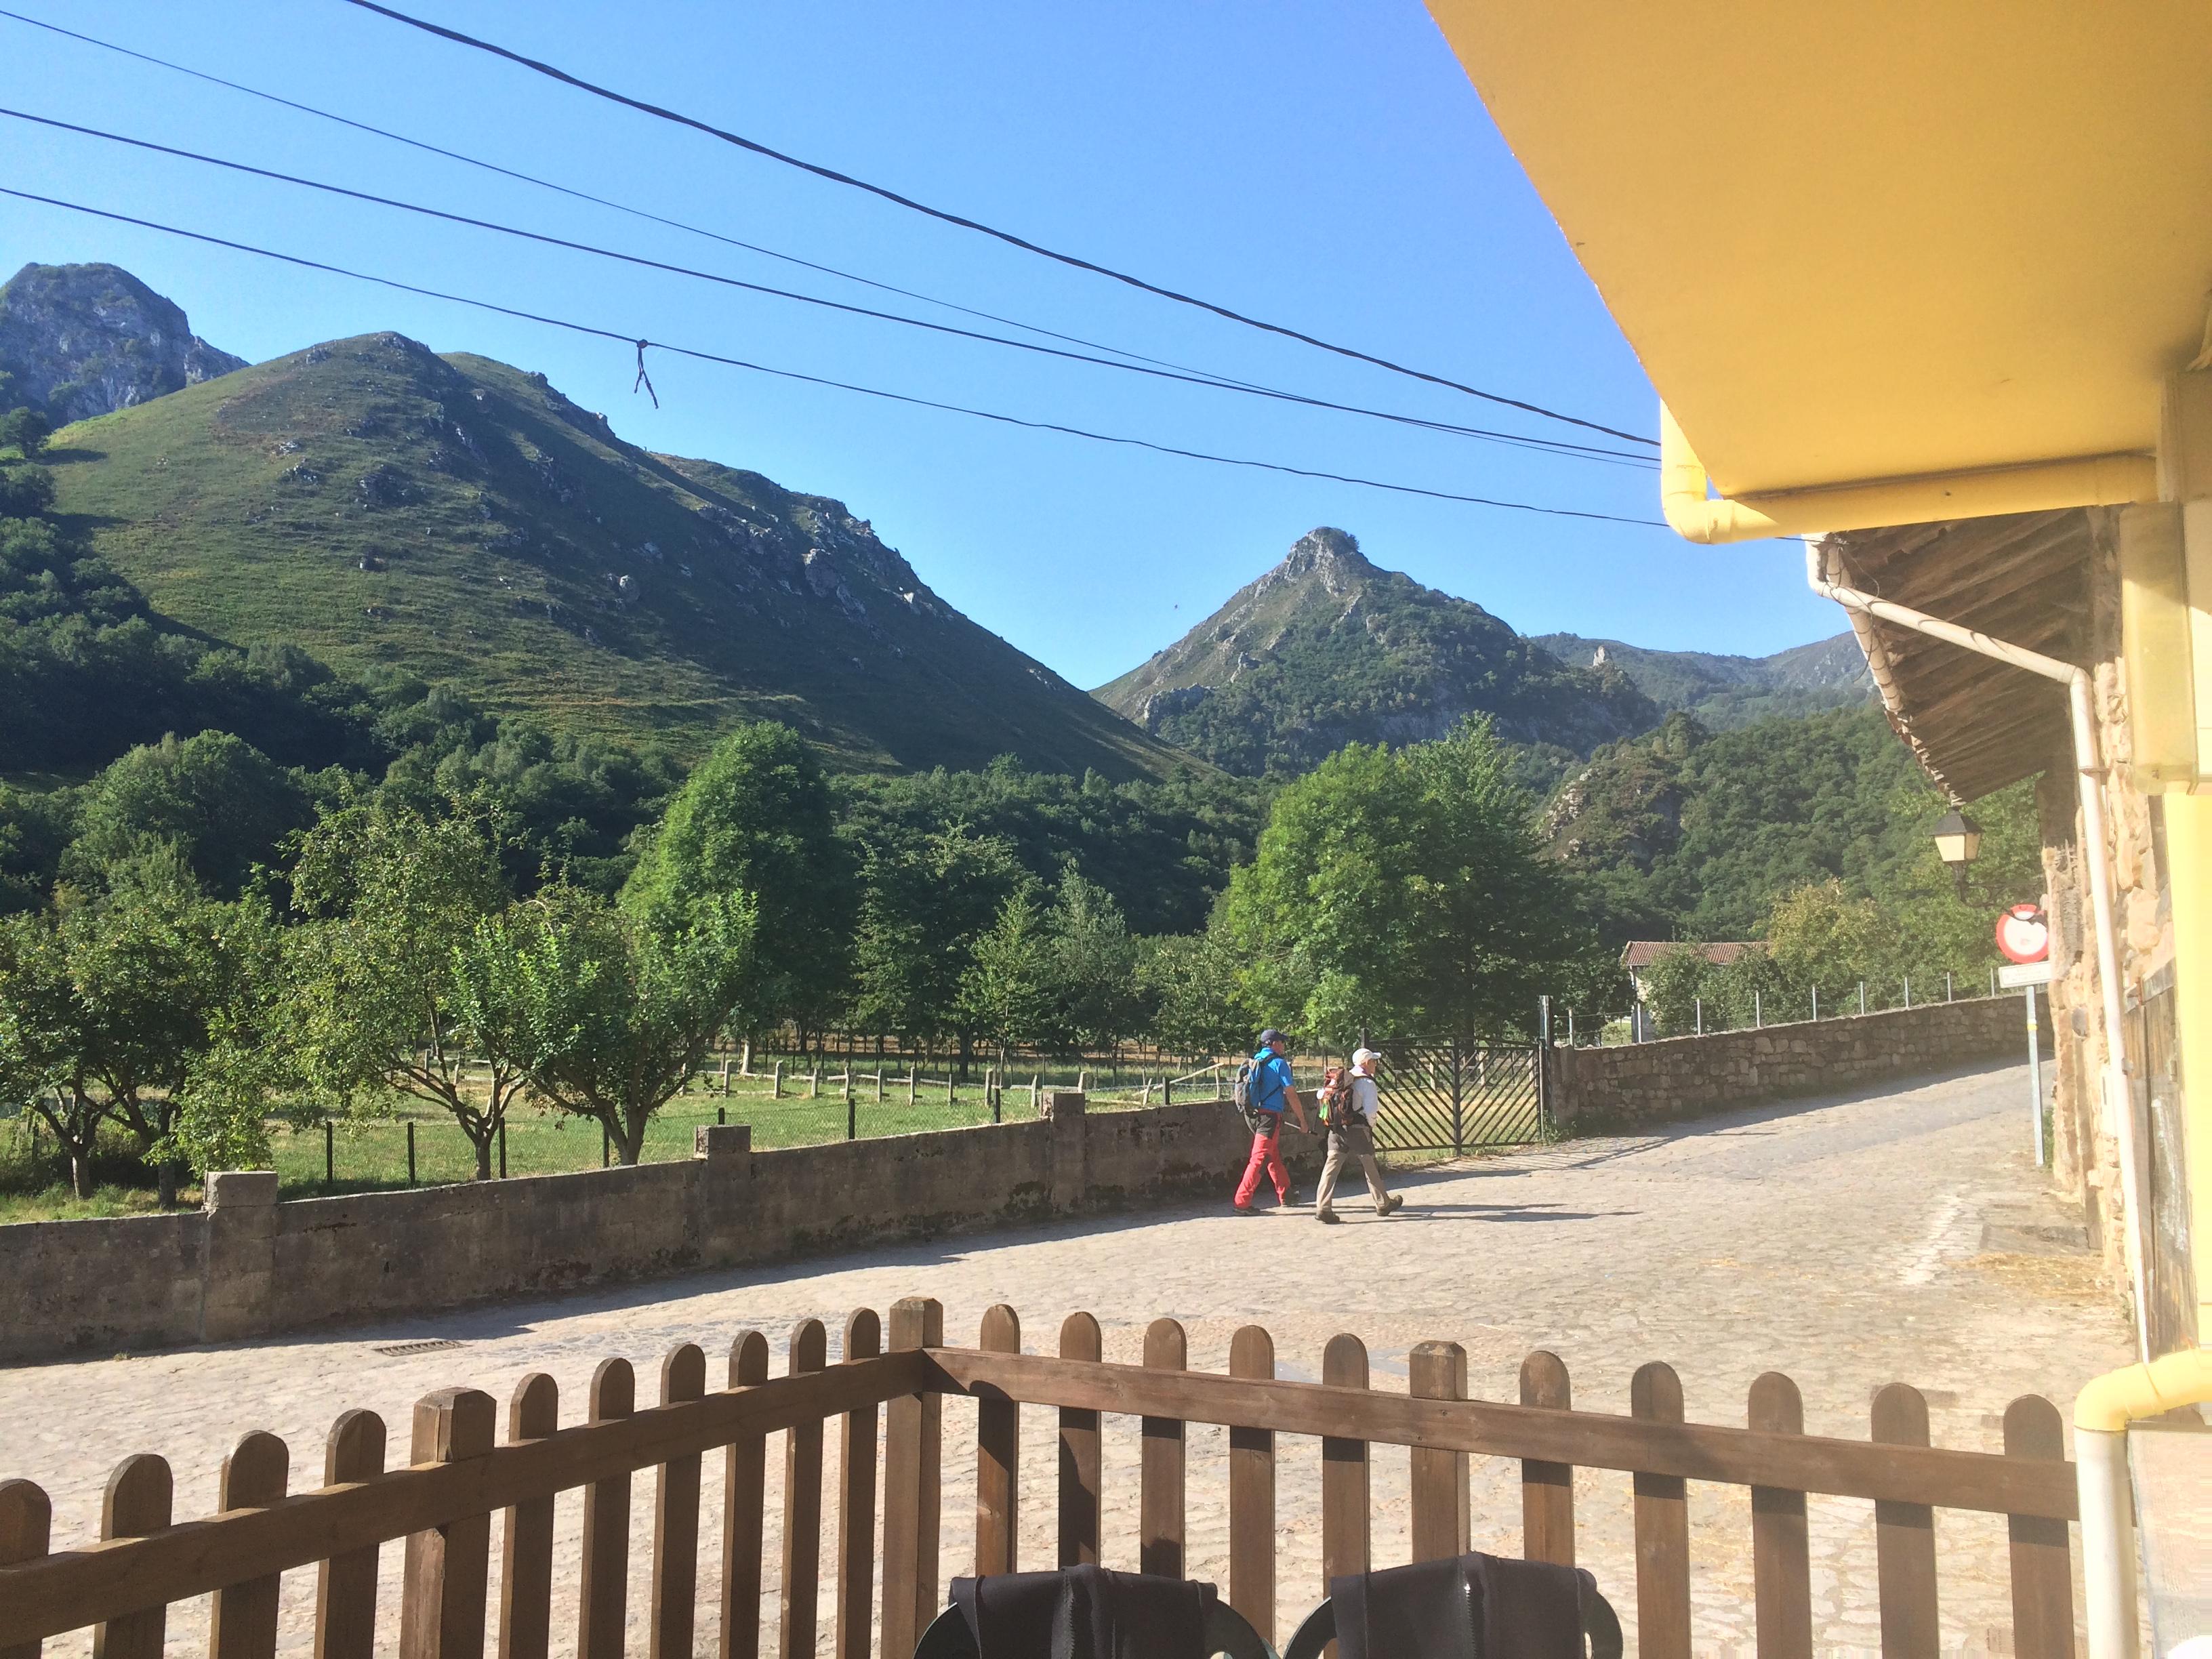 A landscape view of Sobrescobio